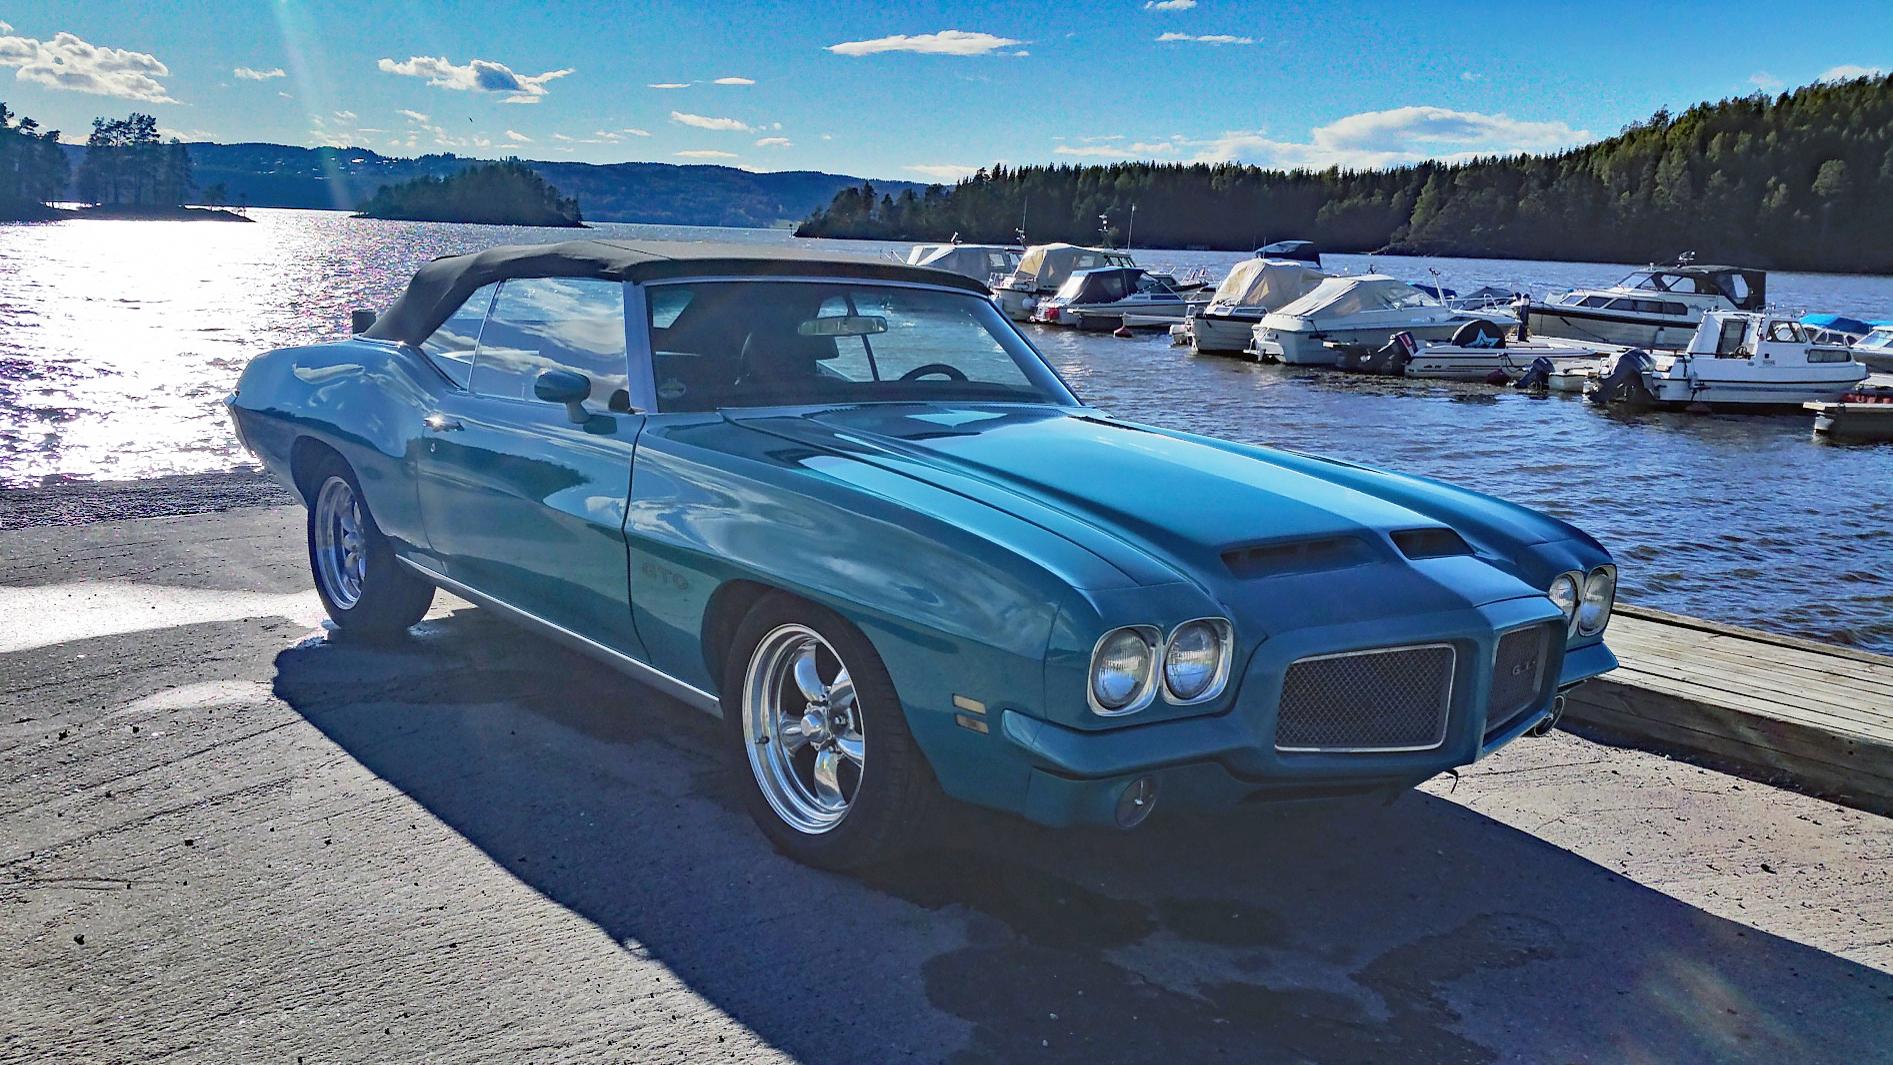 001-1971 Pontiac GTO convertible, Eier-medlem 001